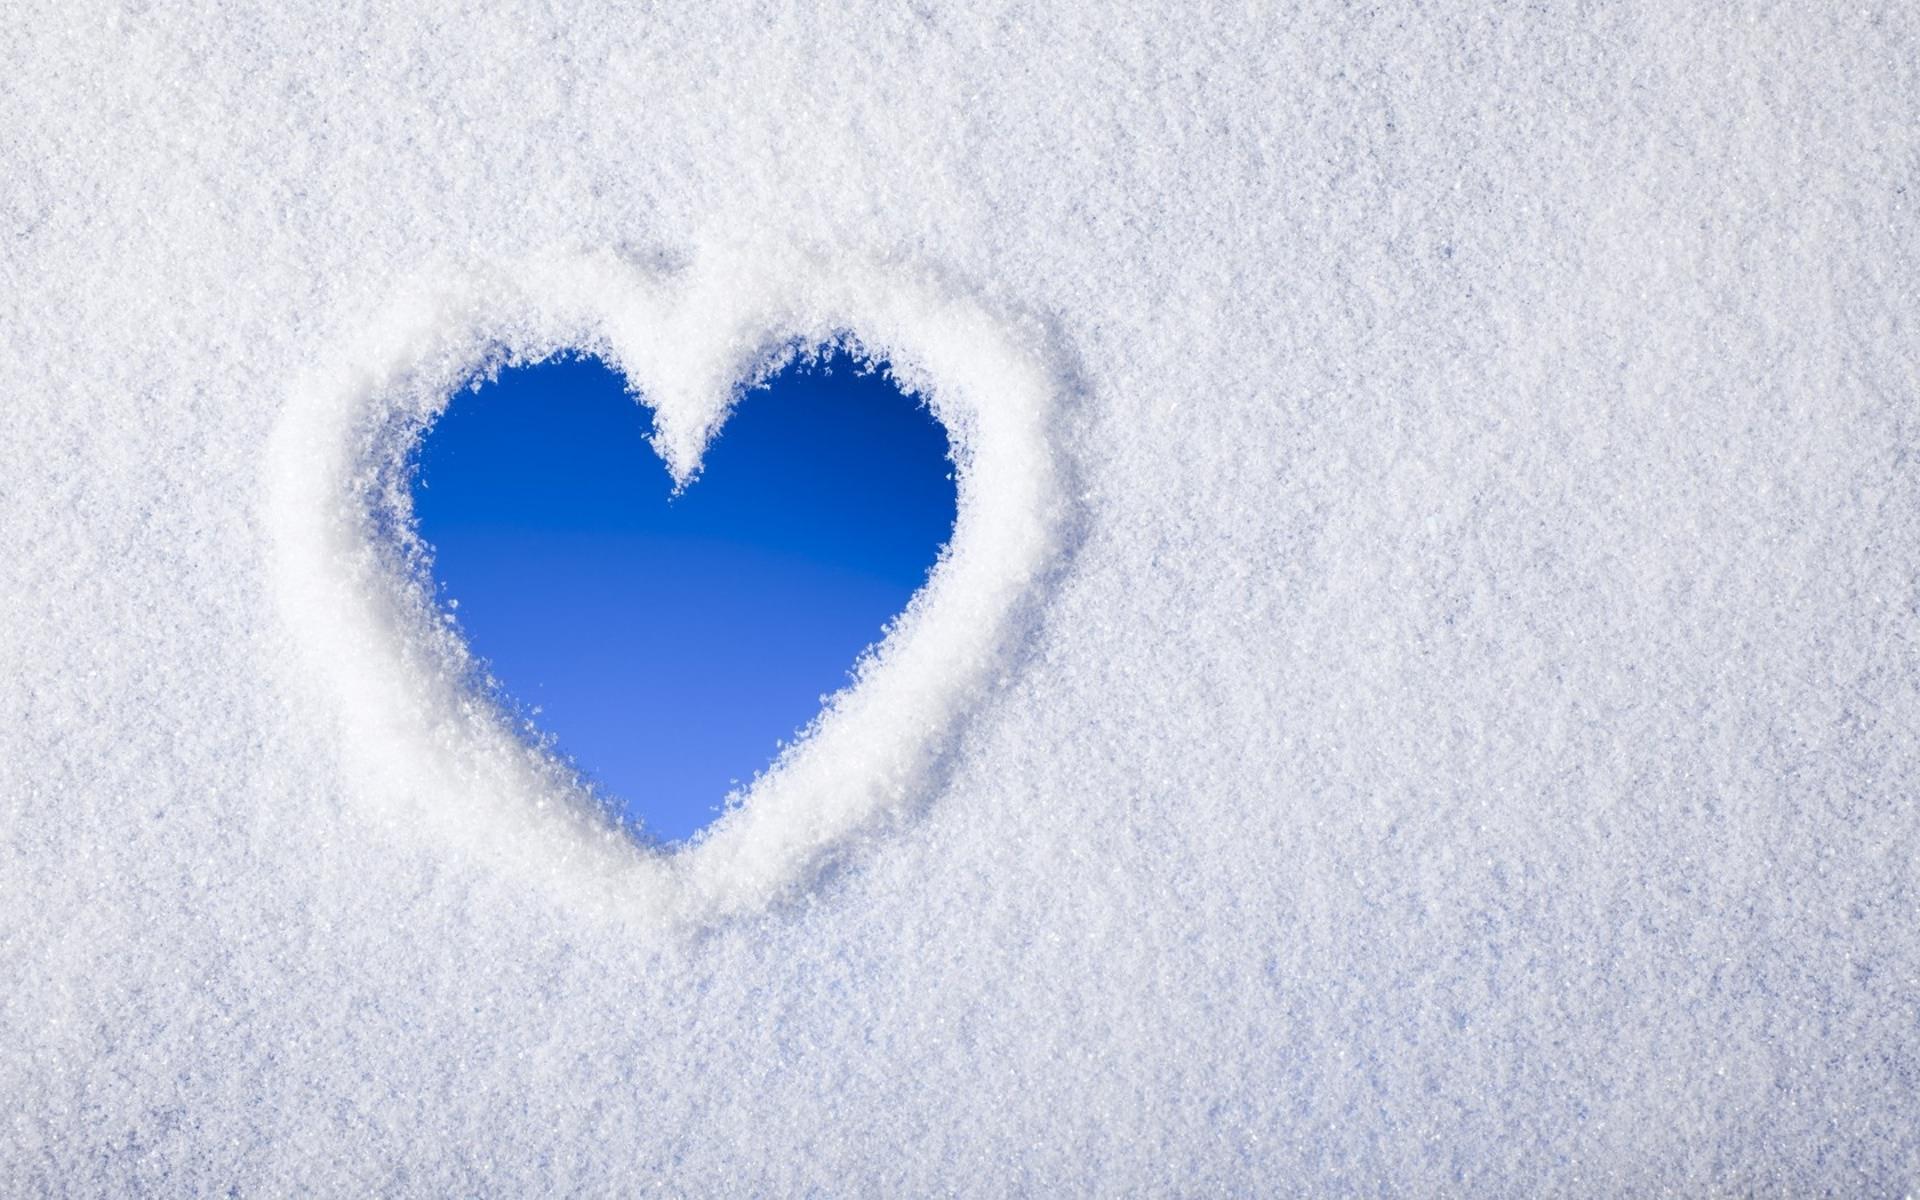 snow heart background